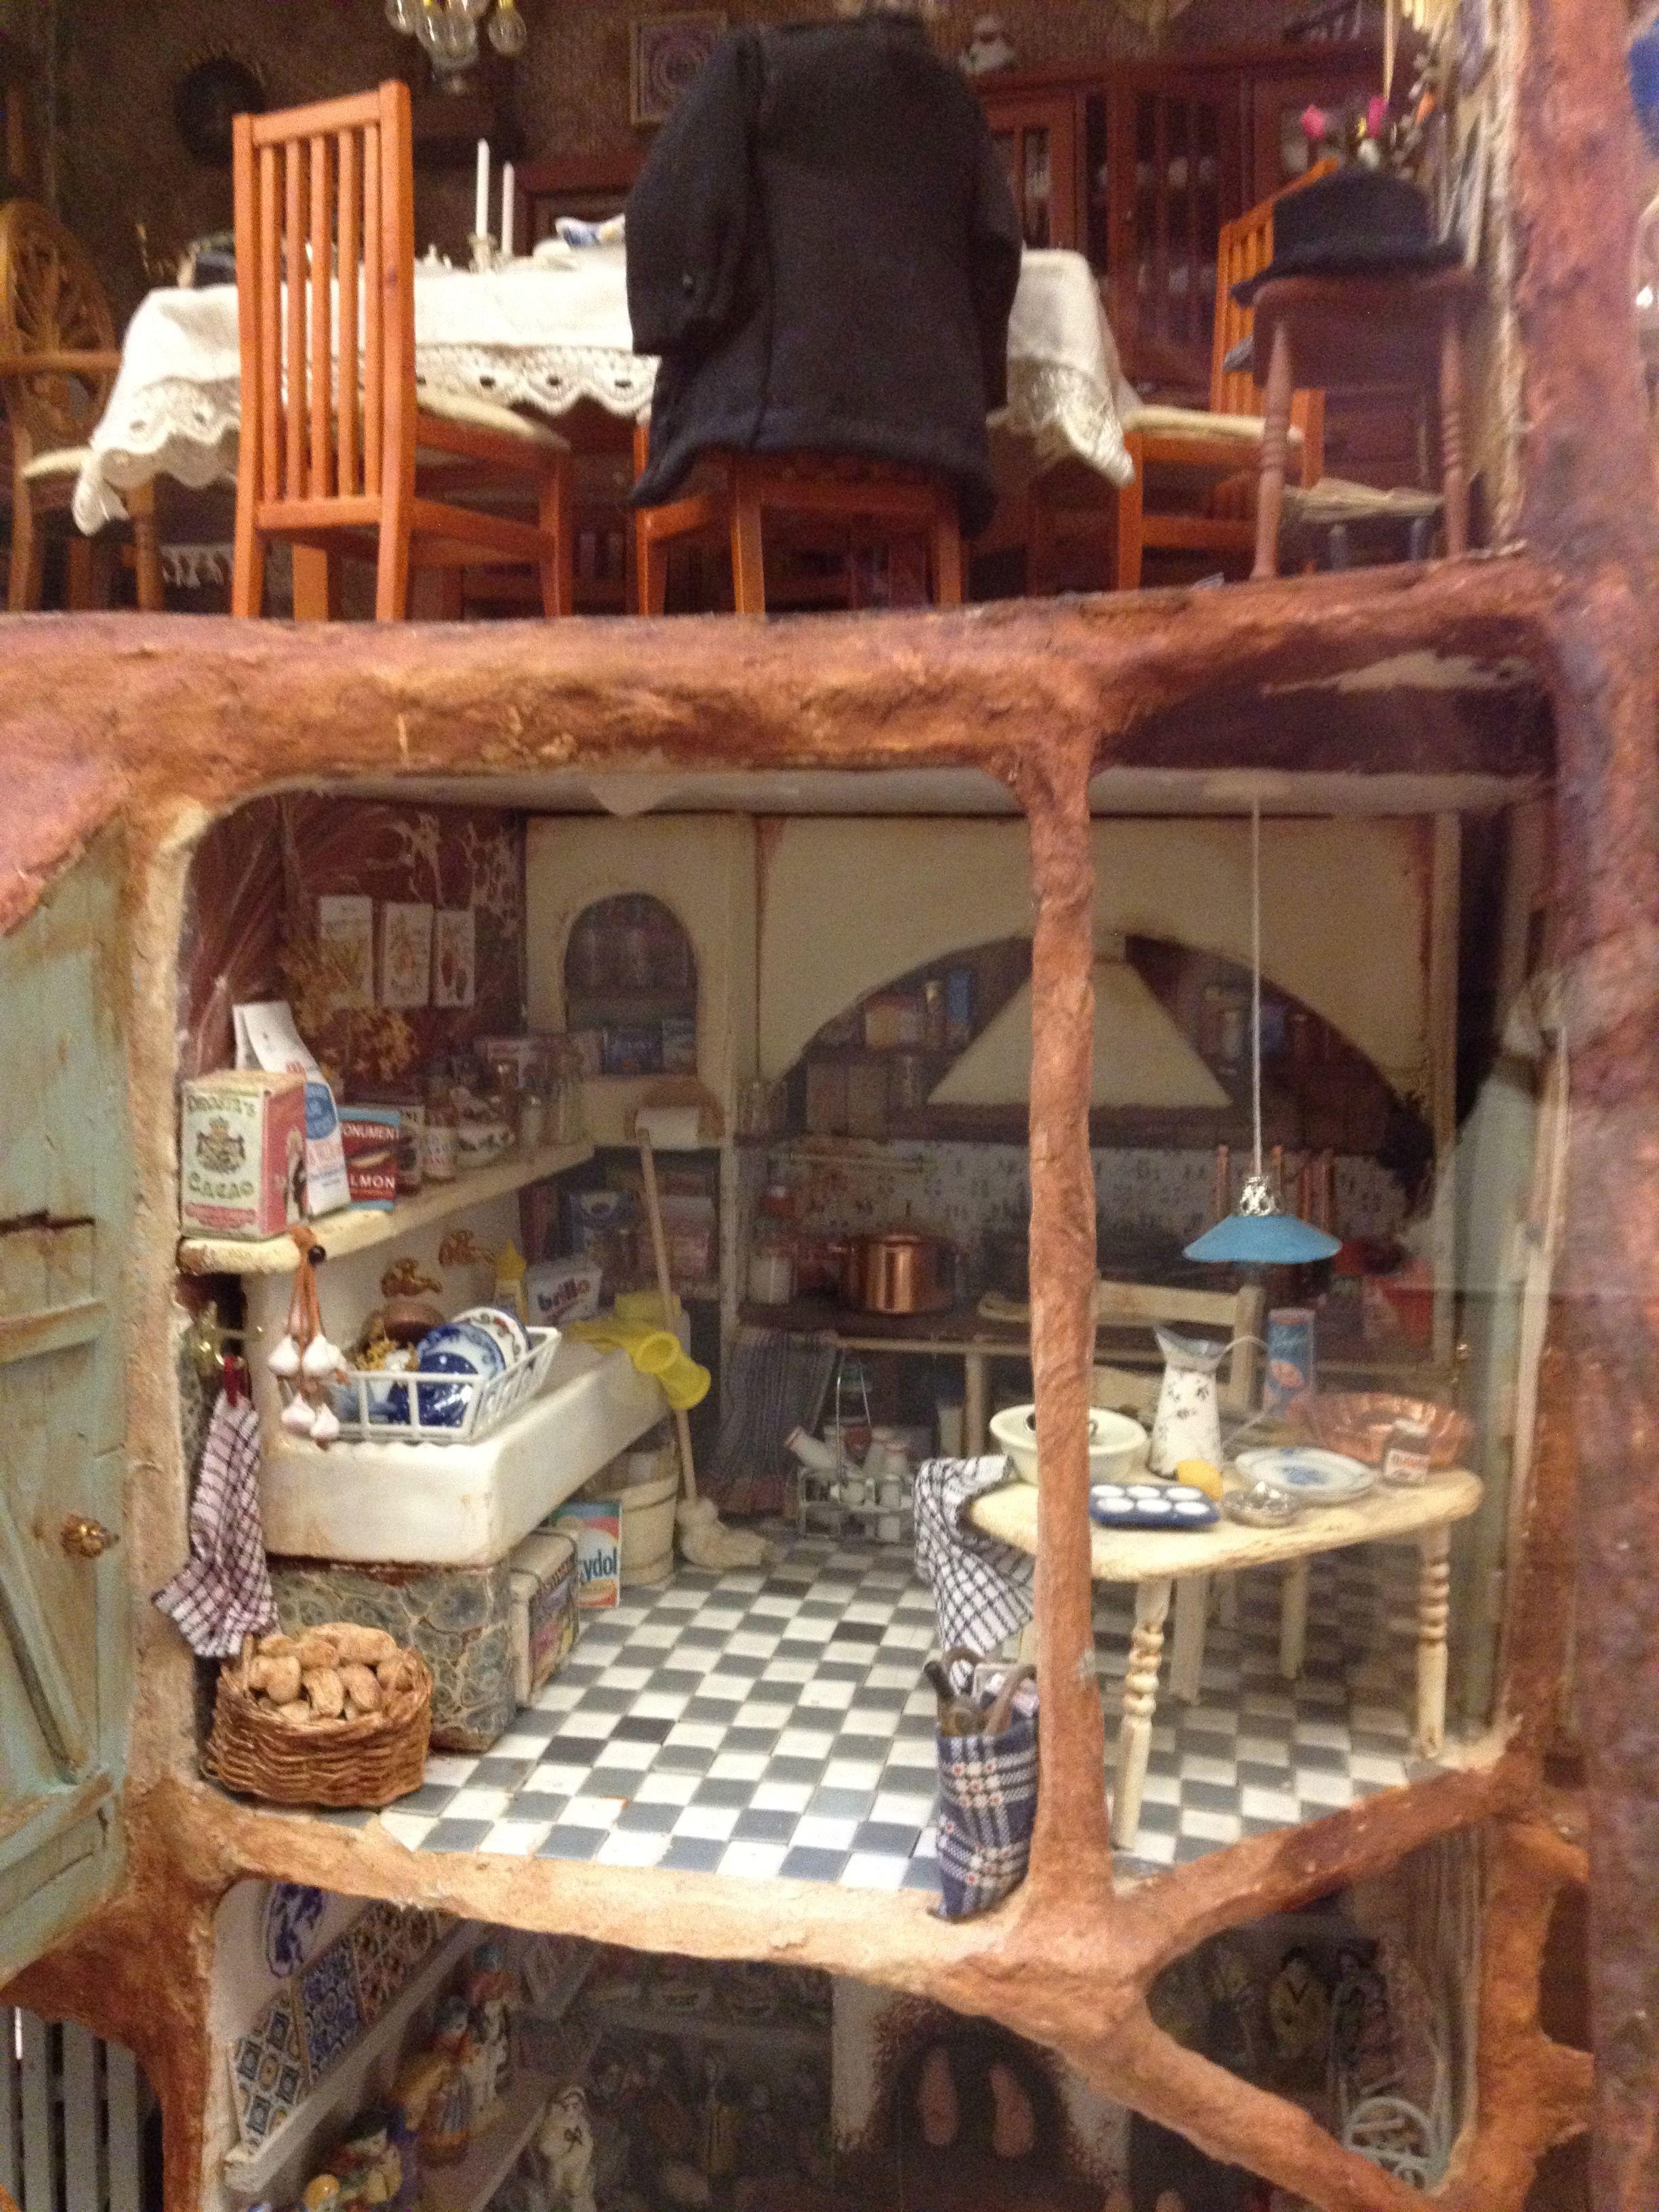 Kitchen Mouse House, Amsterdam NL | Your Kitchen | Pinterest ...